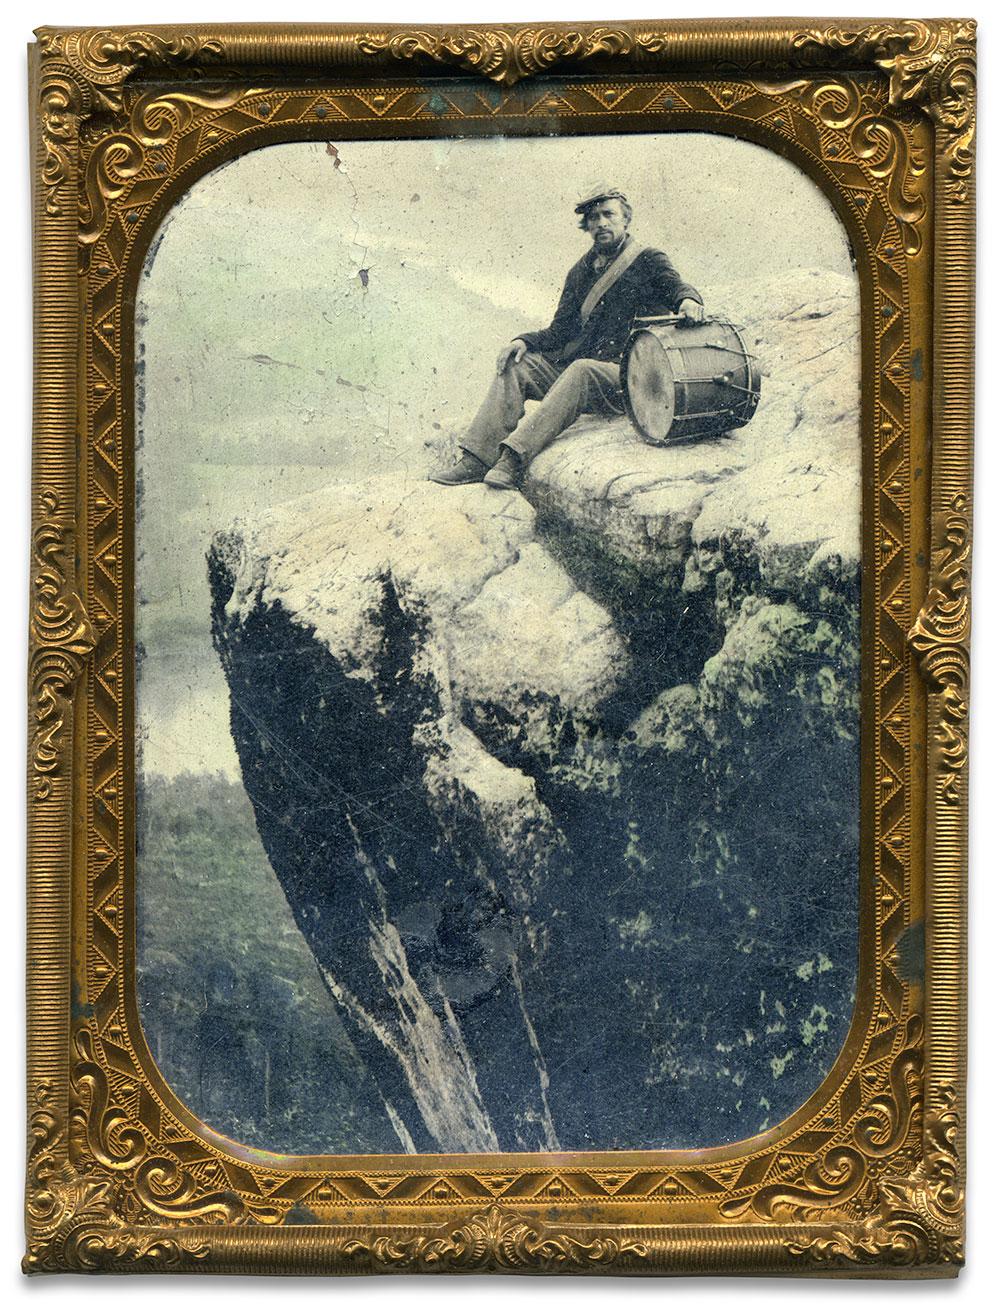 Quarter-plate tintype attributed to Robert M. and James B. Linn of Chattanooga. Tenn.